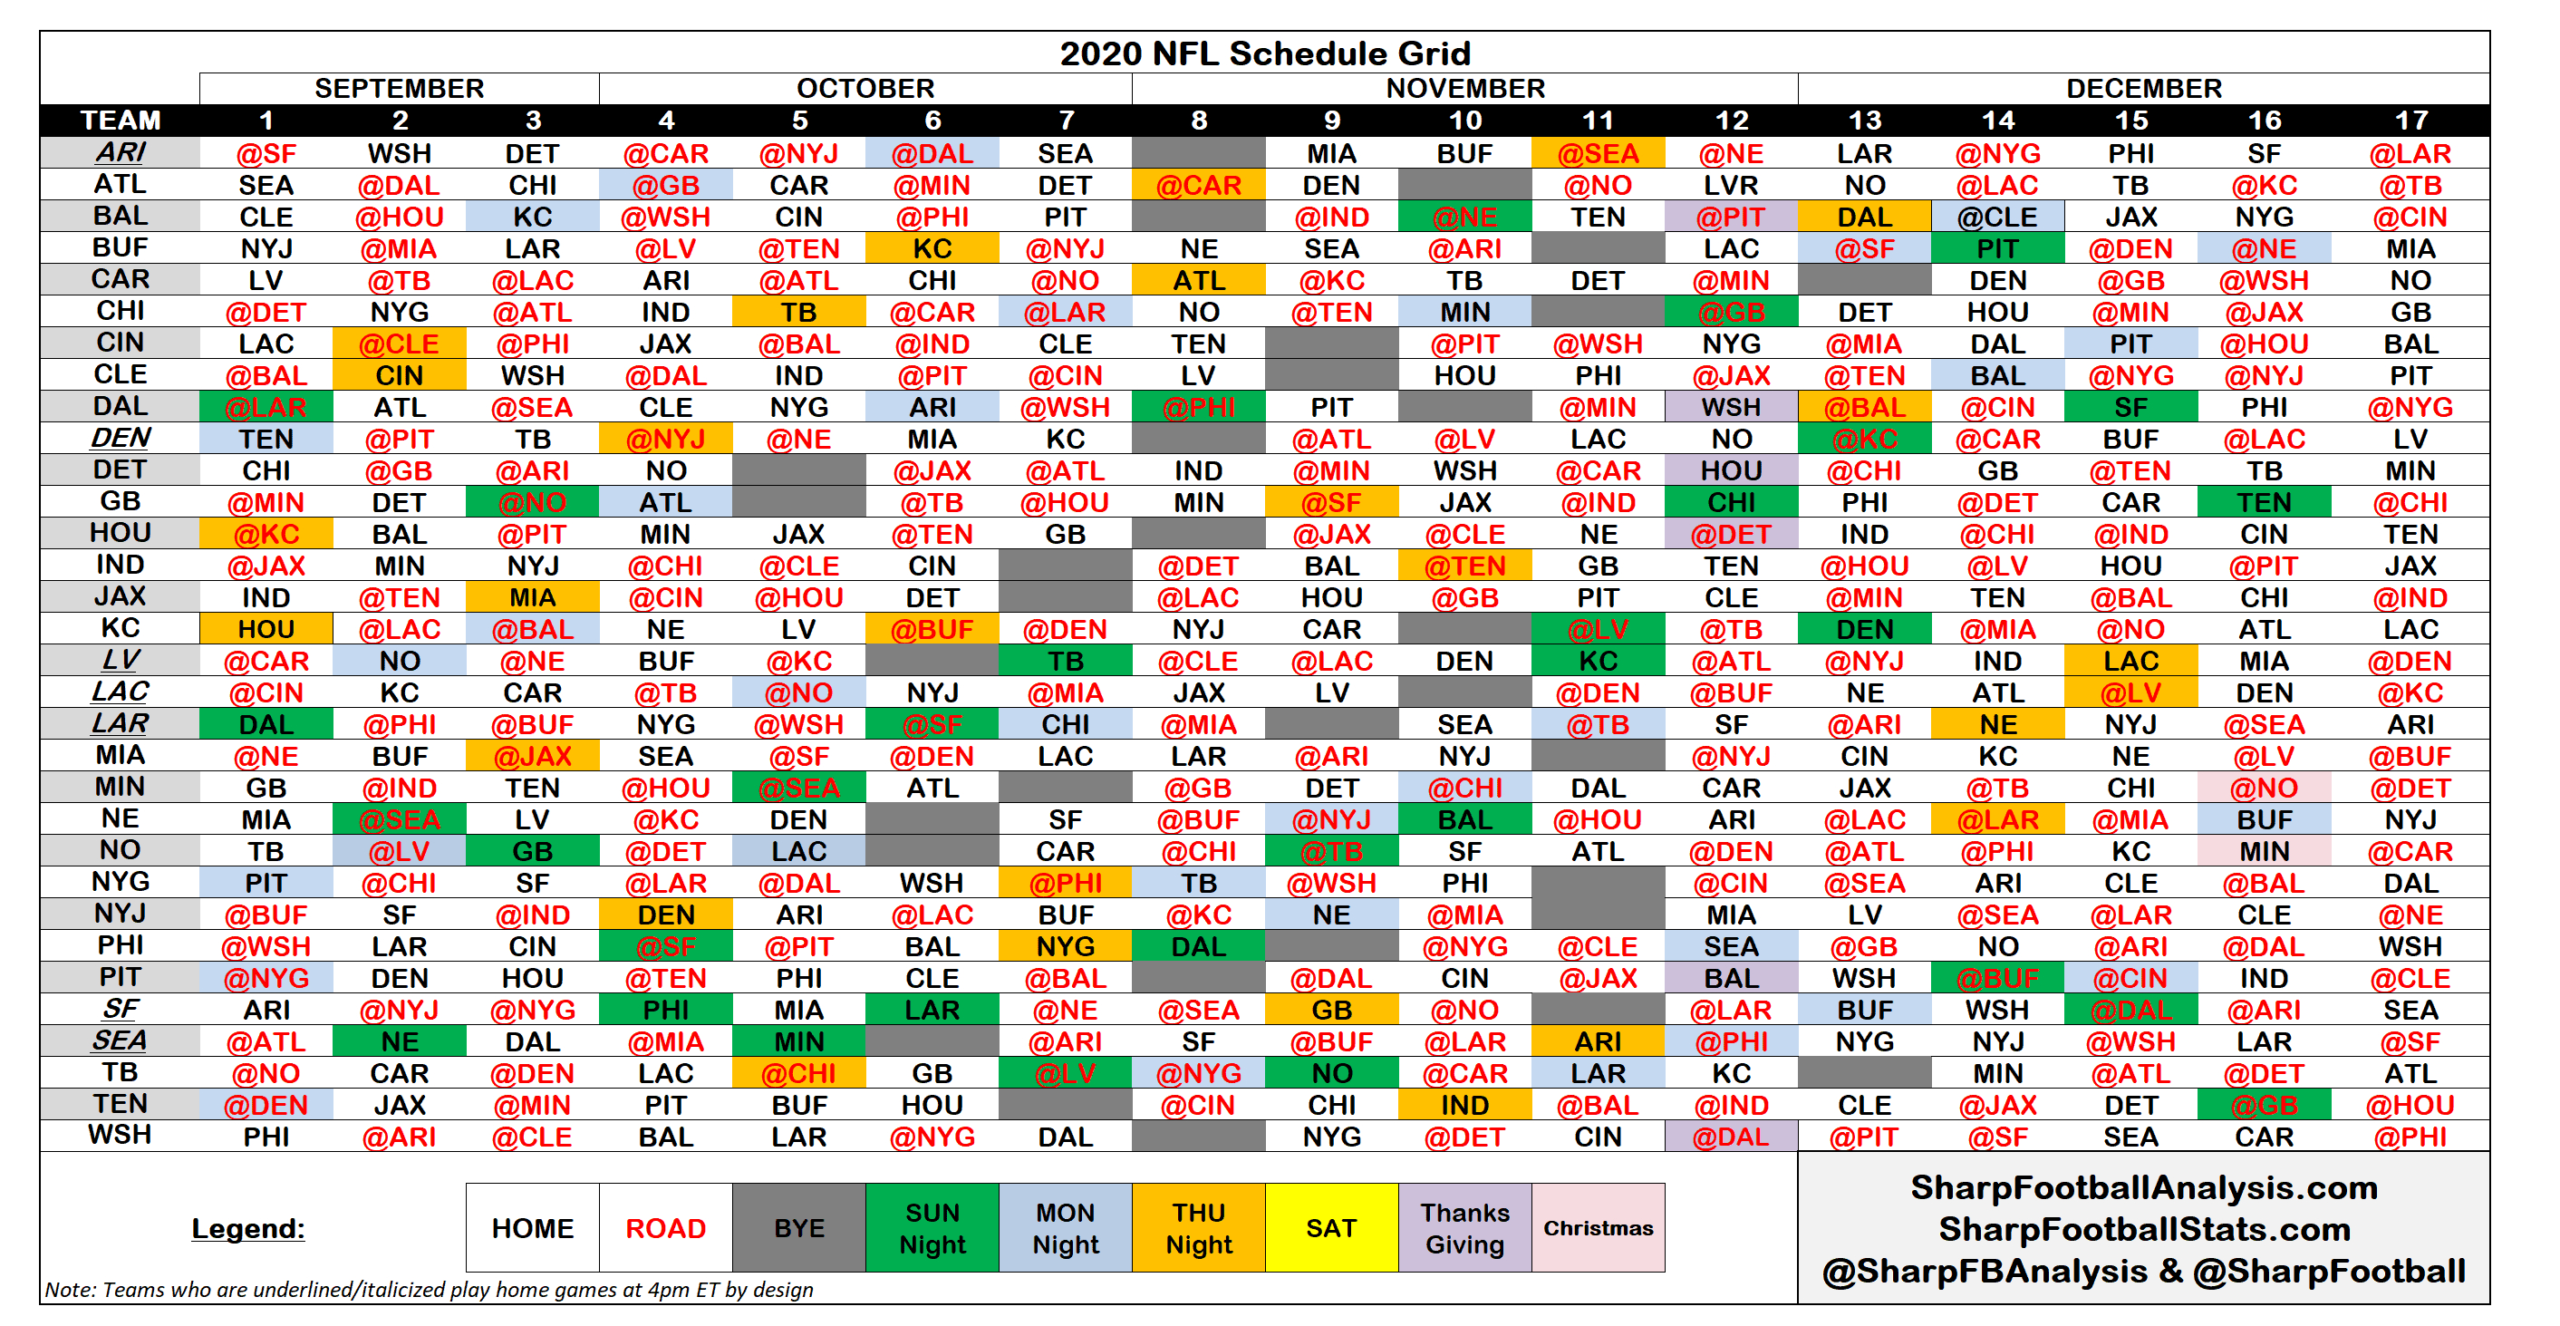 Nfl Calendar 2022.2020 Nfl Regular Season Schedule Grid Amp Strength Of Schedule Inside 2021 Printable Nf In 2021 Printable Nfl Schedule Printable Calendar Template Nfl